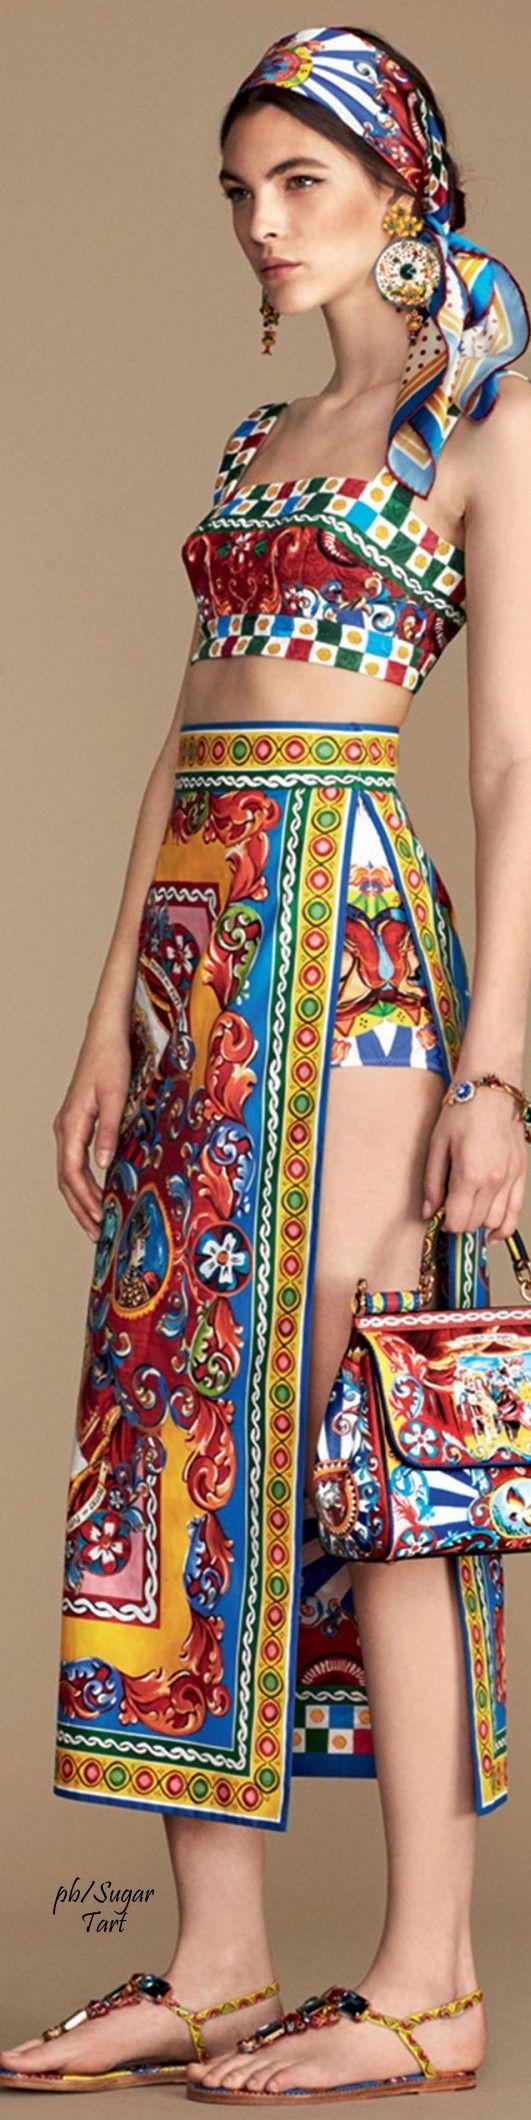 Dolce & Gabbana Summer 2016                                                                                                                                                      More